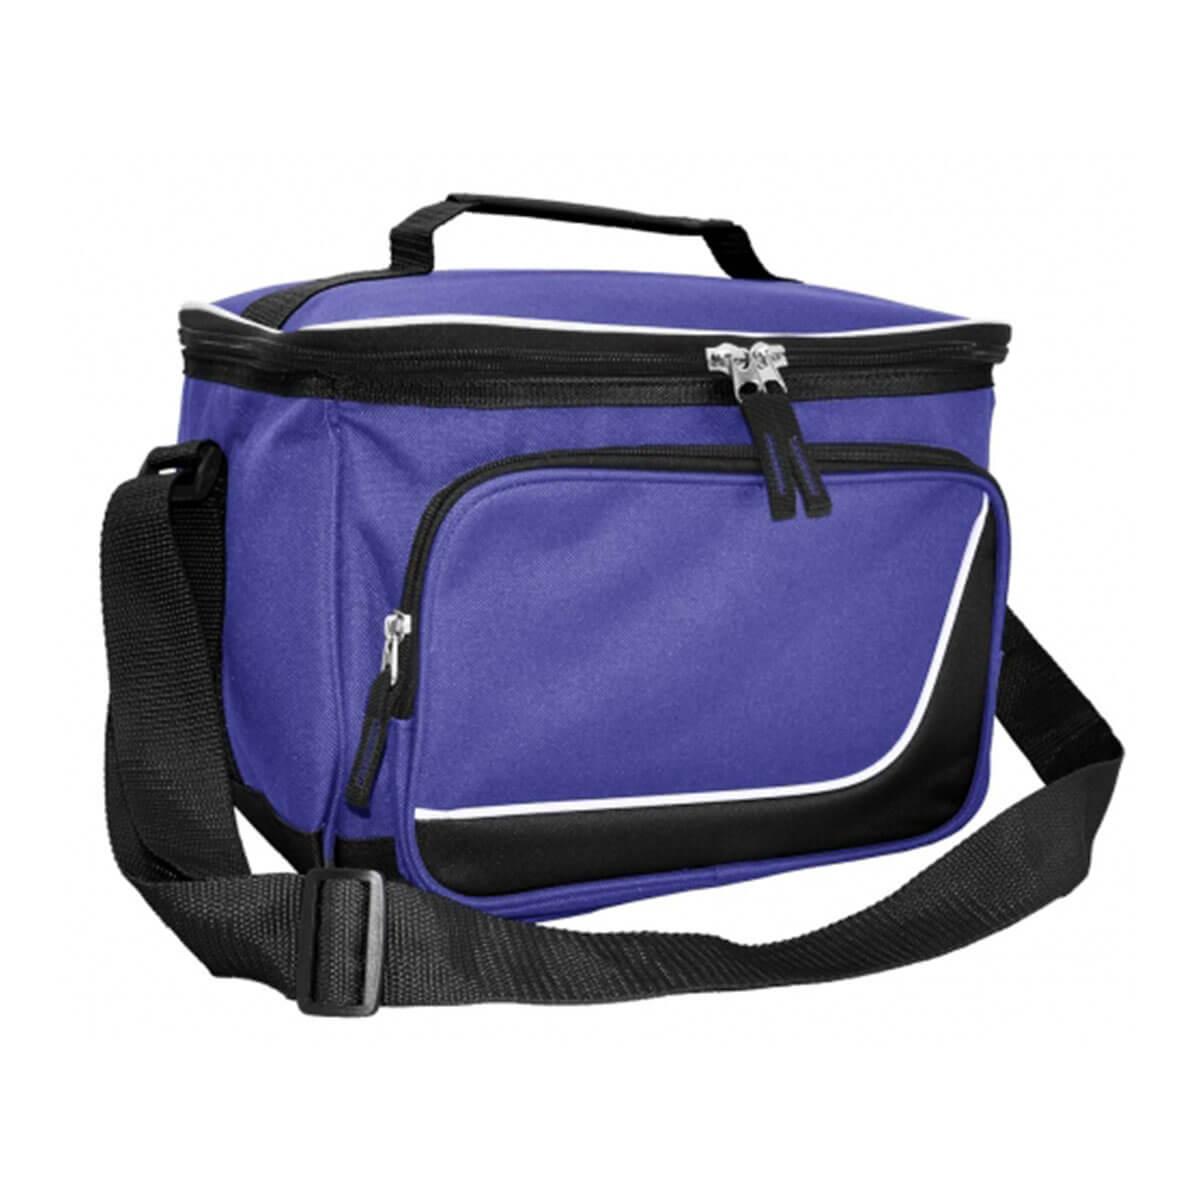 Inspire Cooler Bag-Royal / White / Black